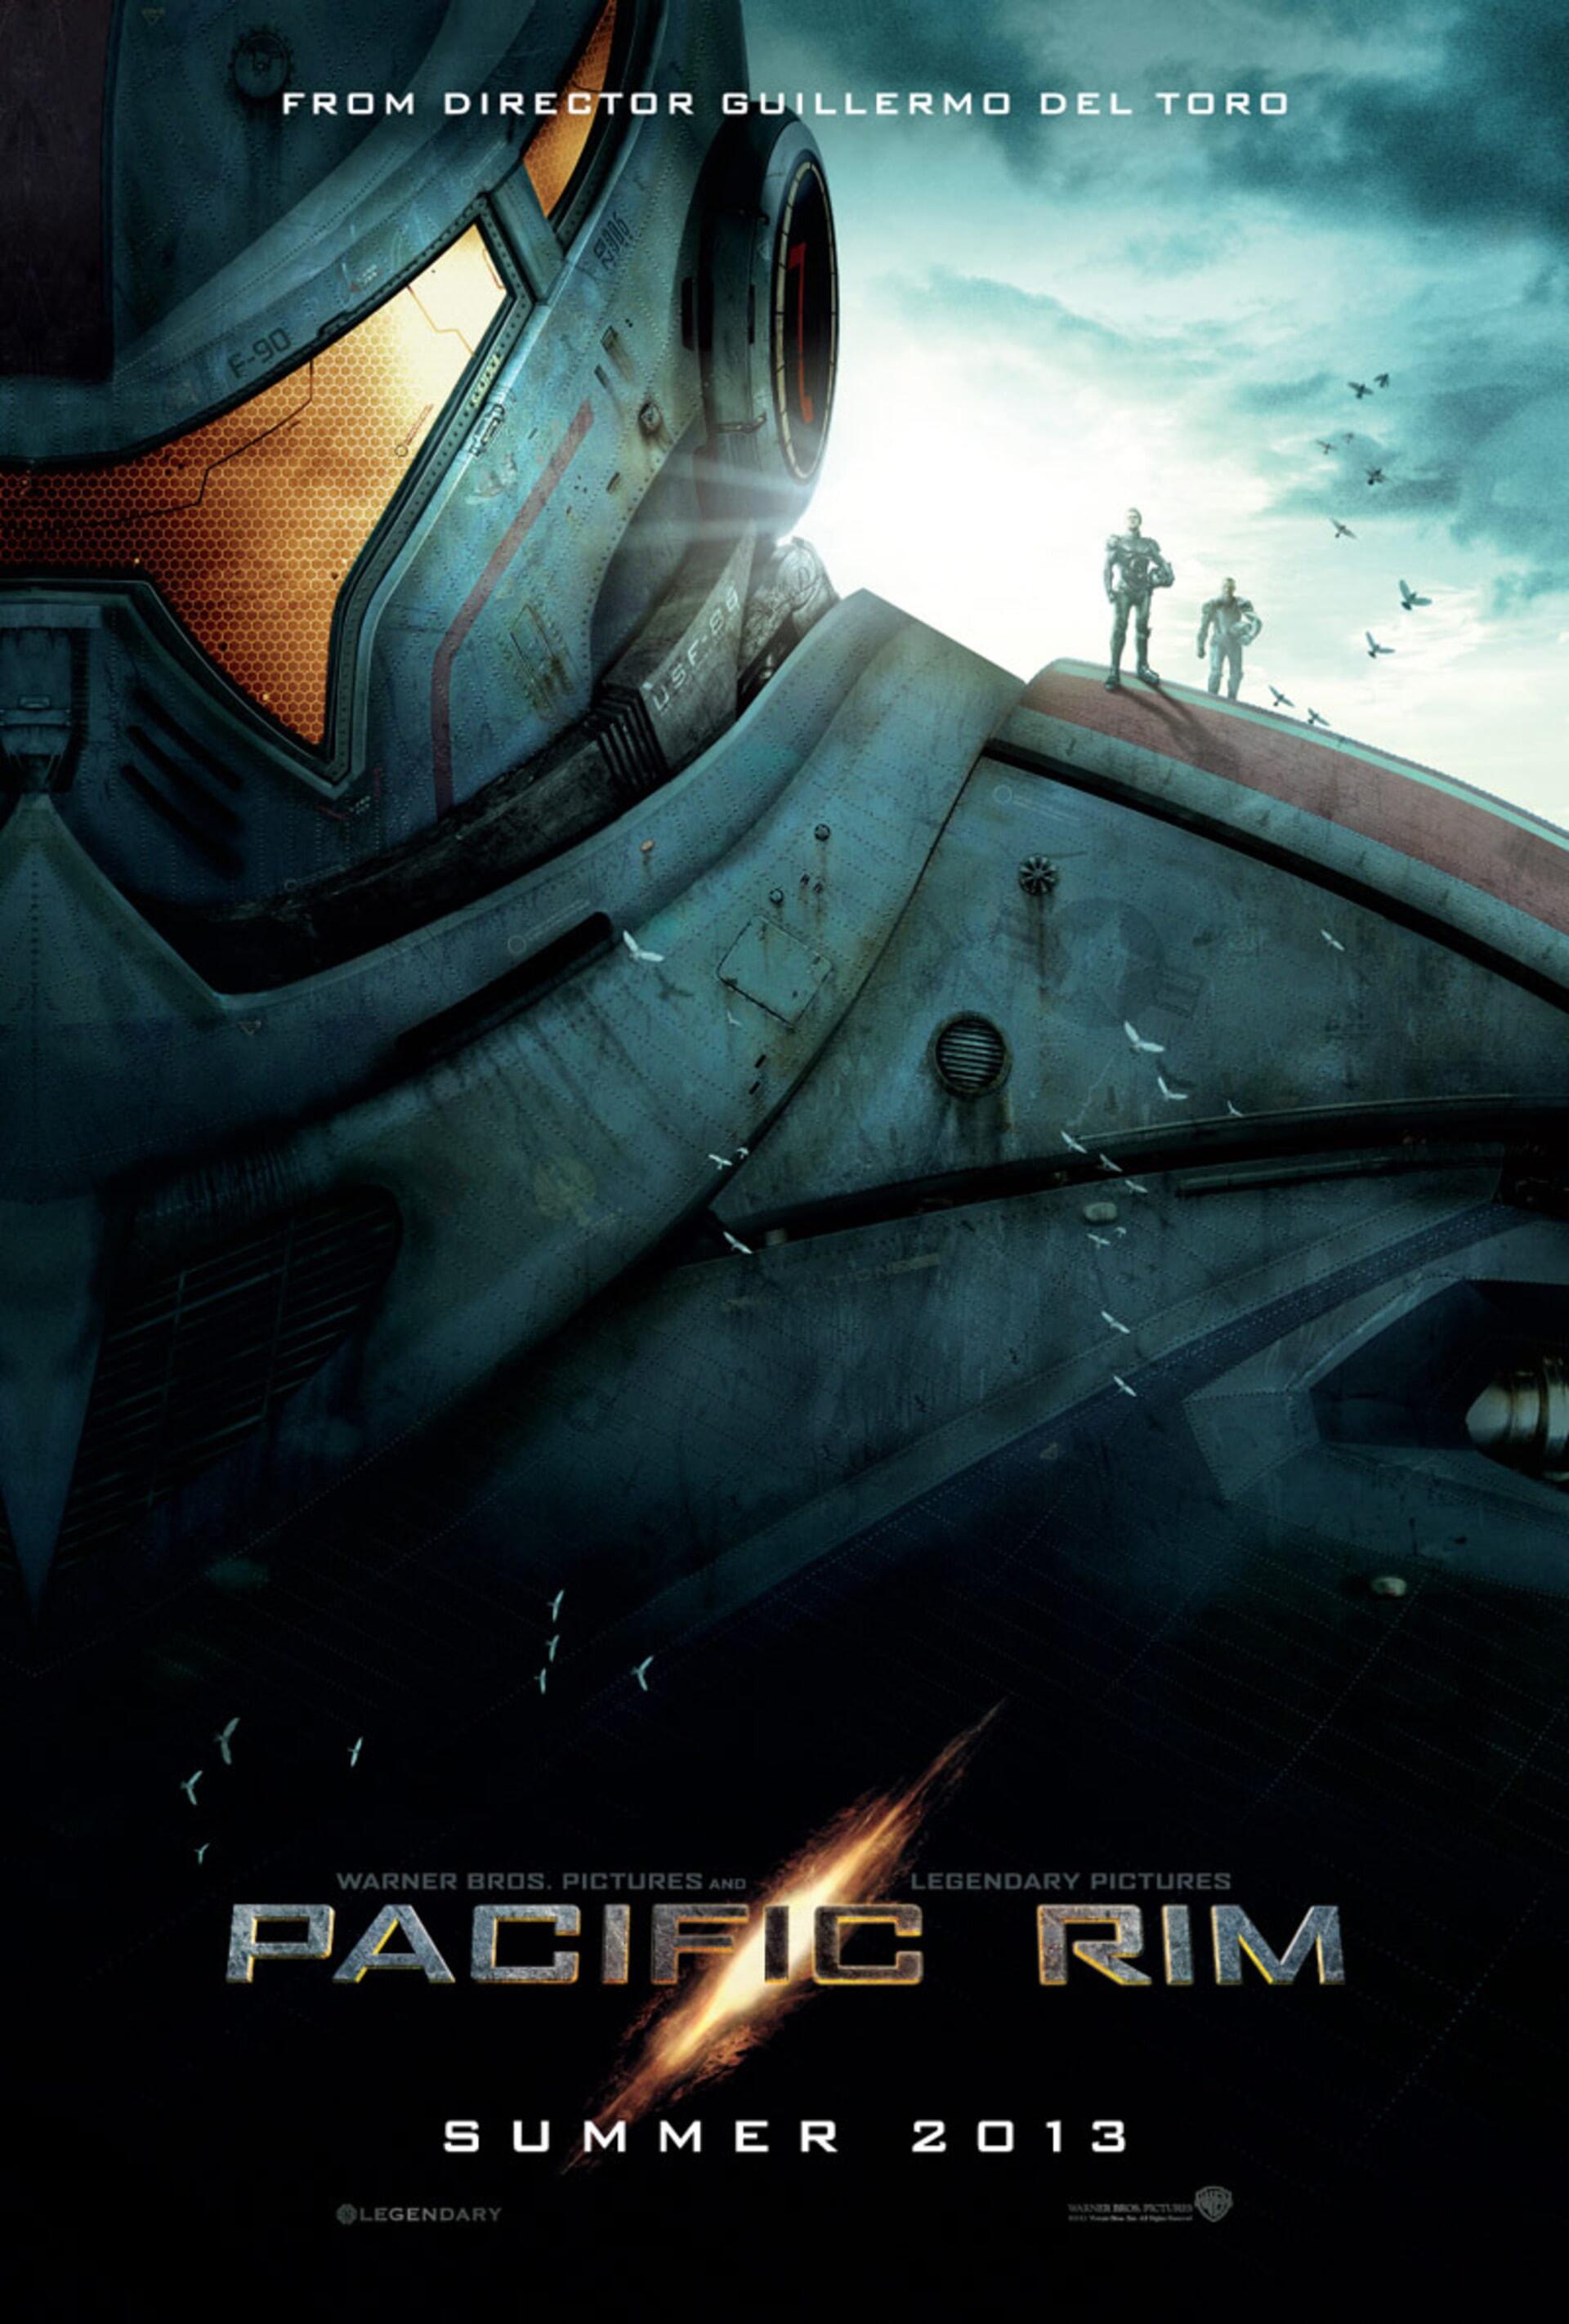 Pacific Rim - Poster 2